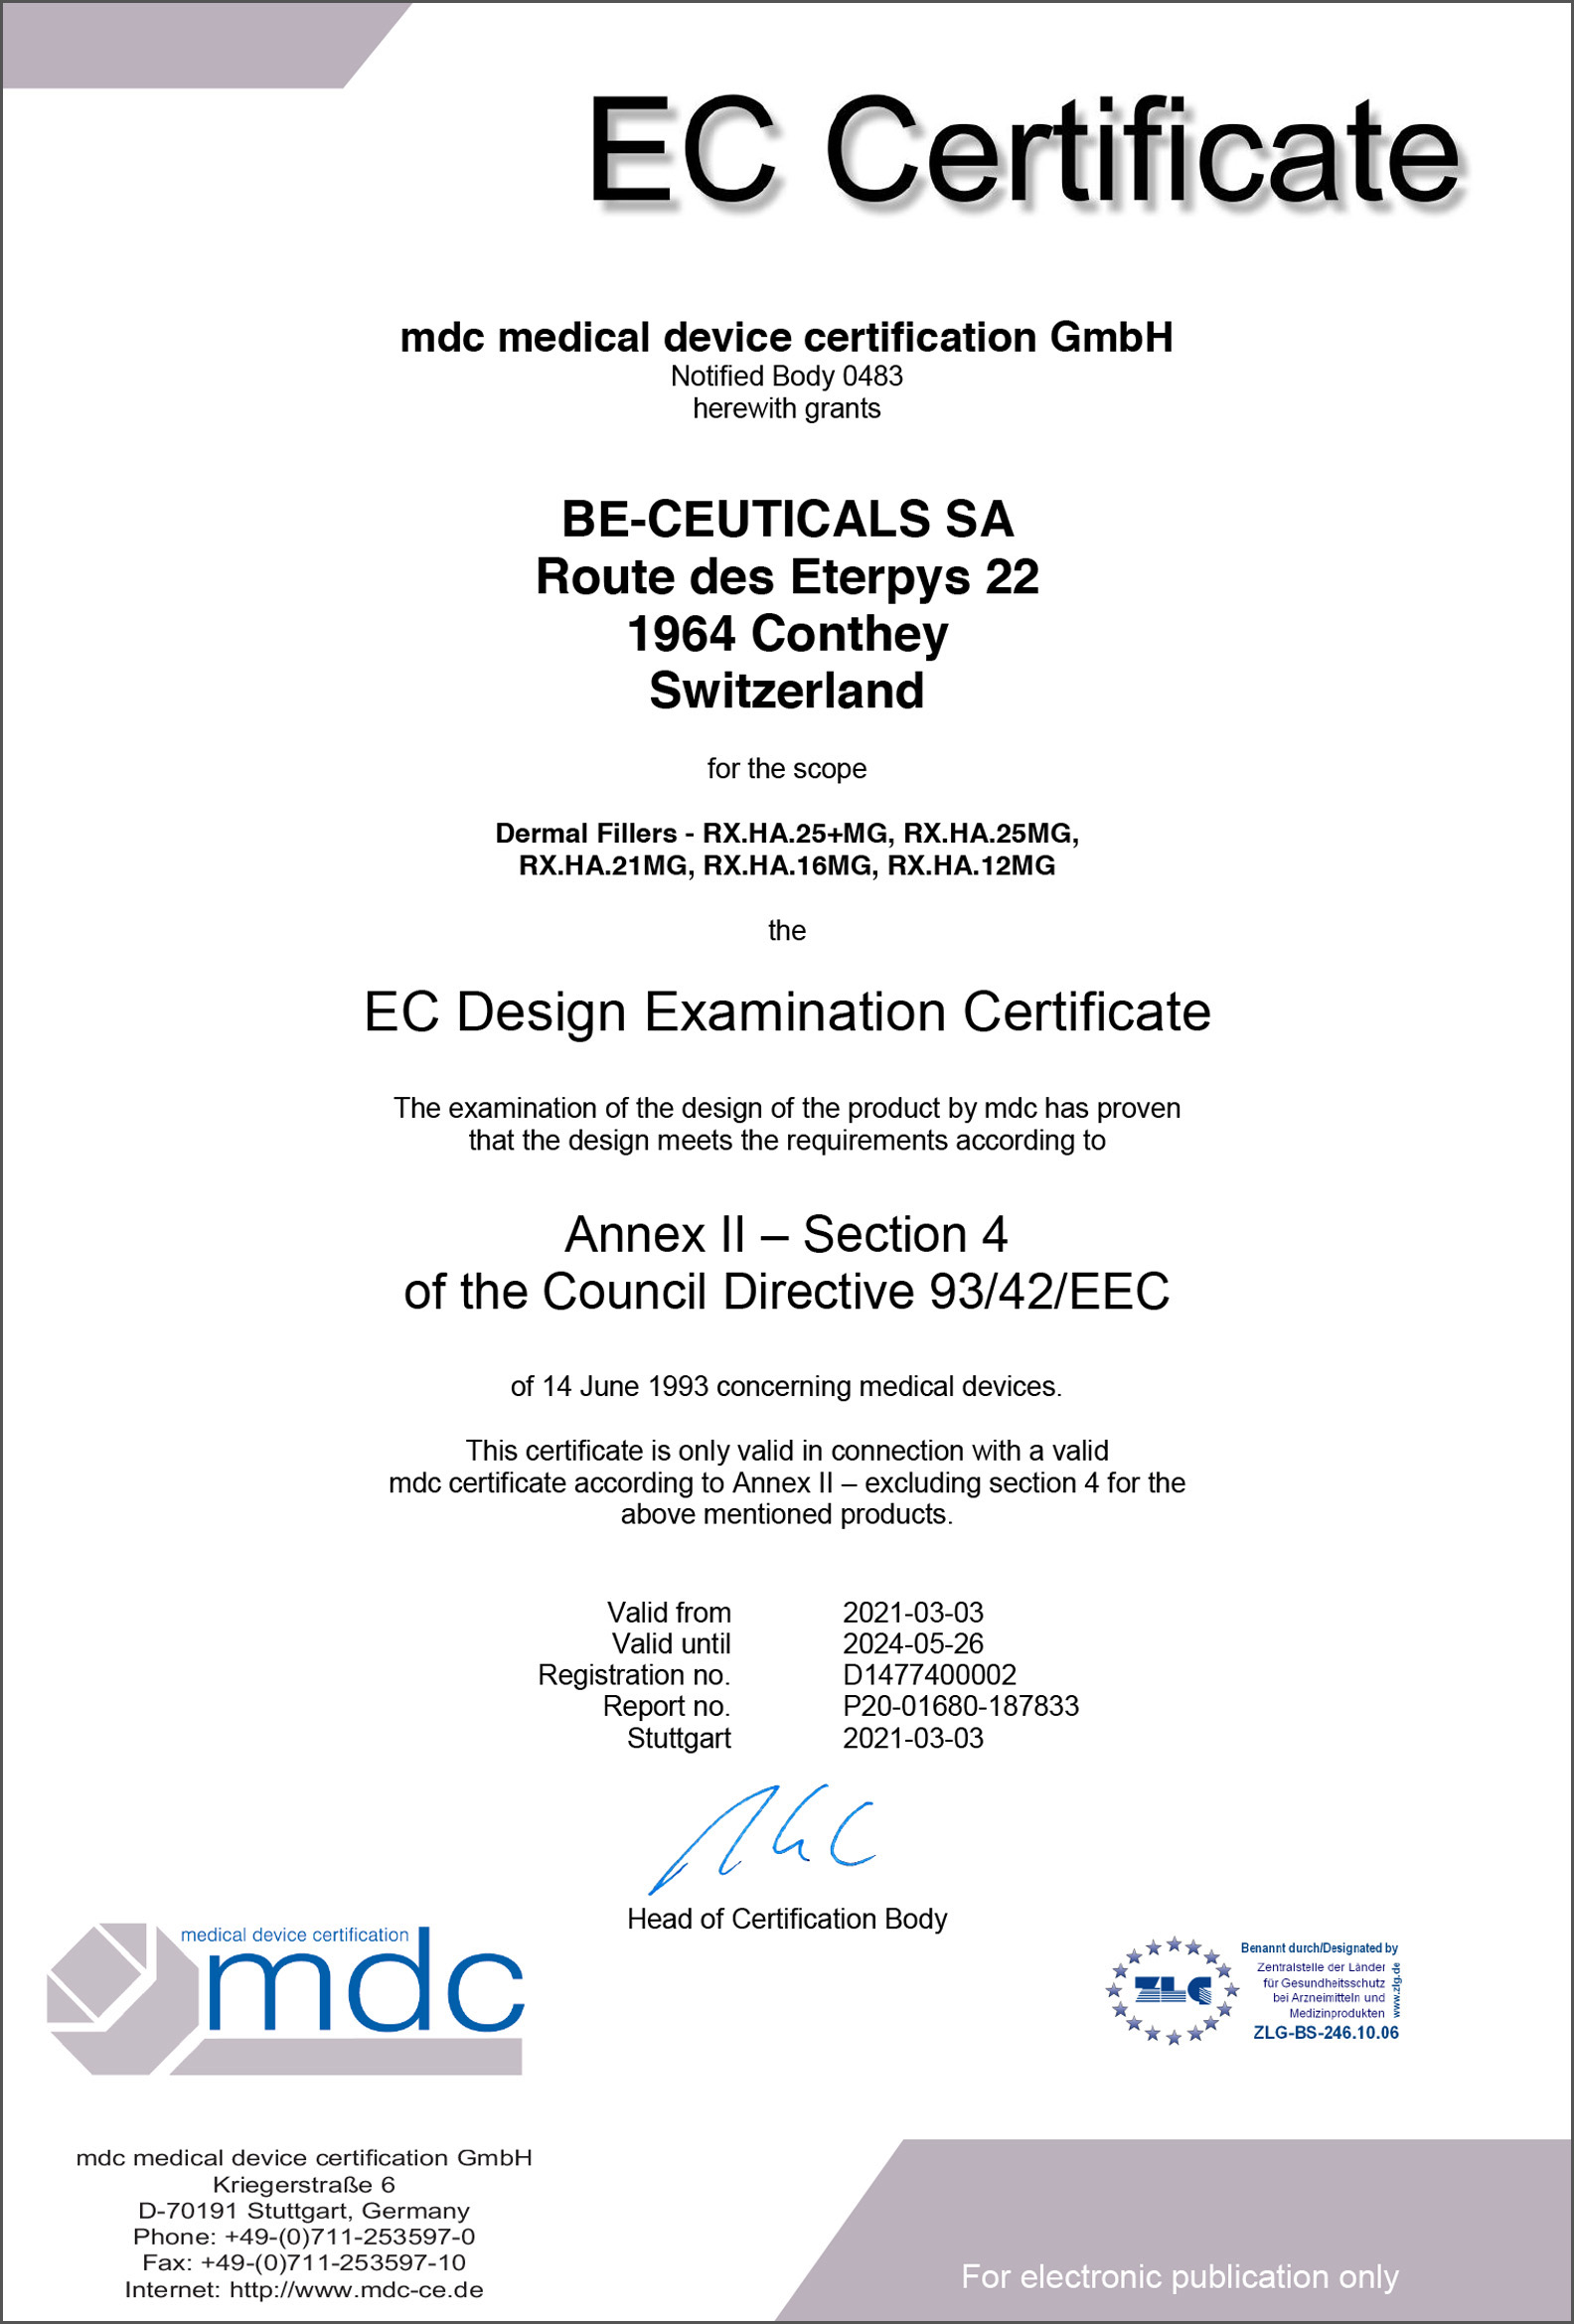 Medical Device Certification - Design Examination Certificate (EEC)